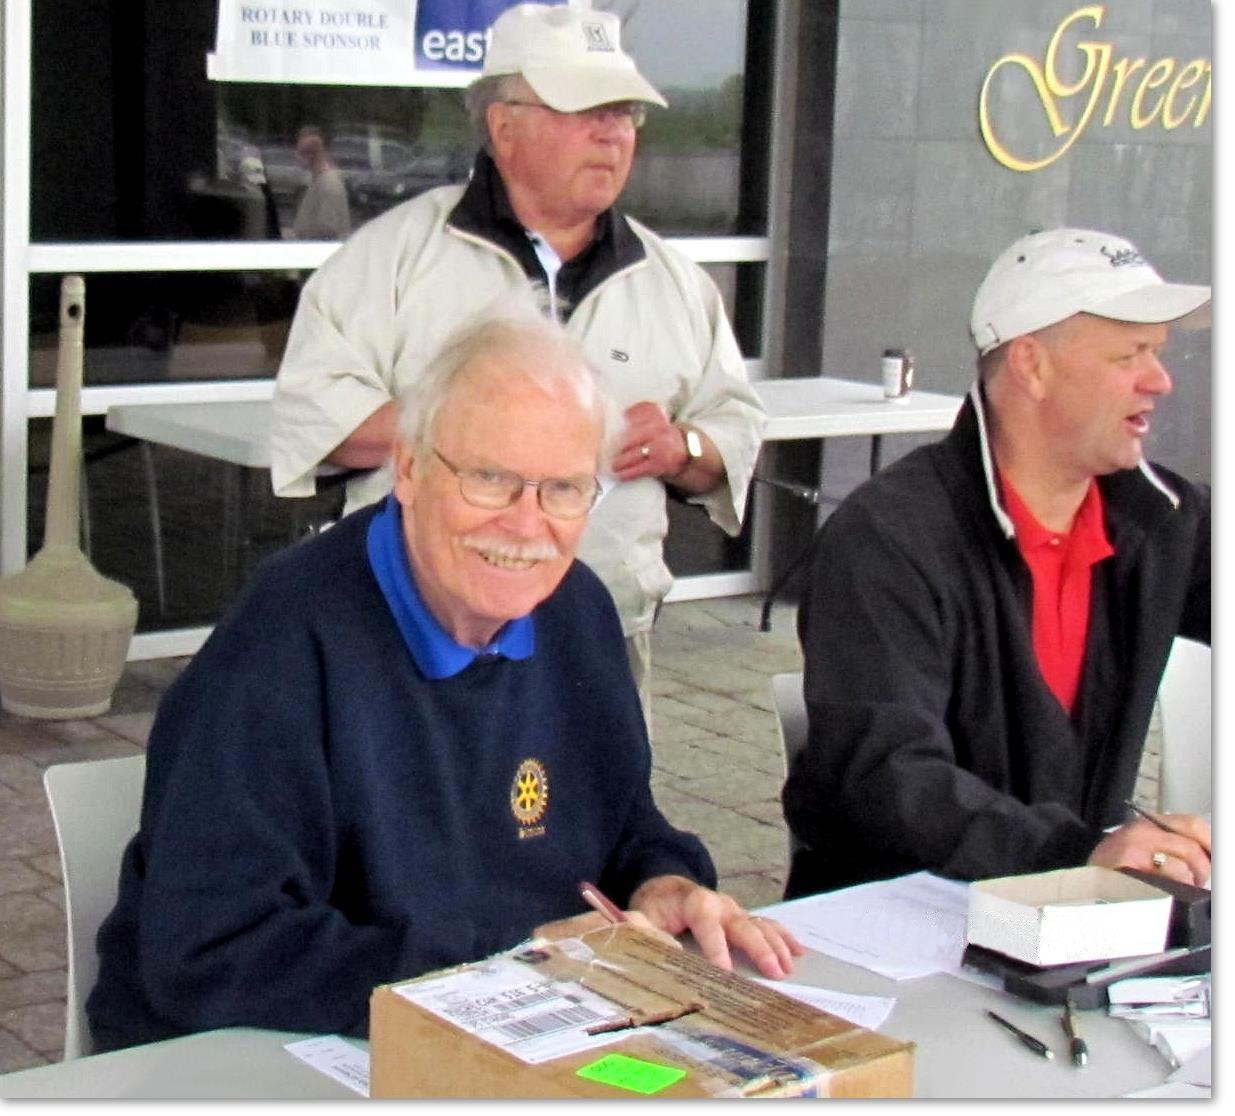 Rotary Golf Registration